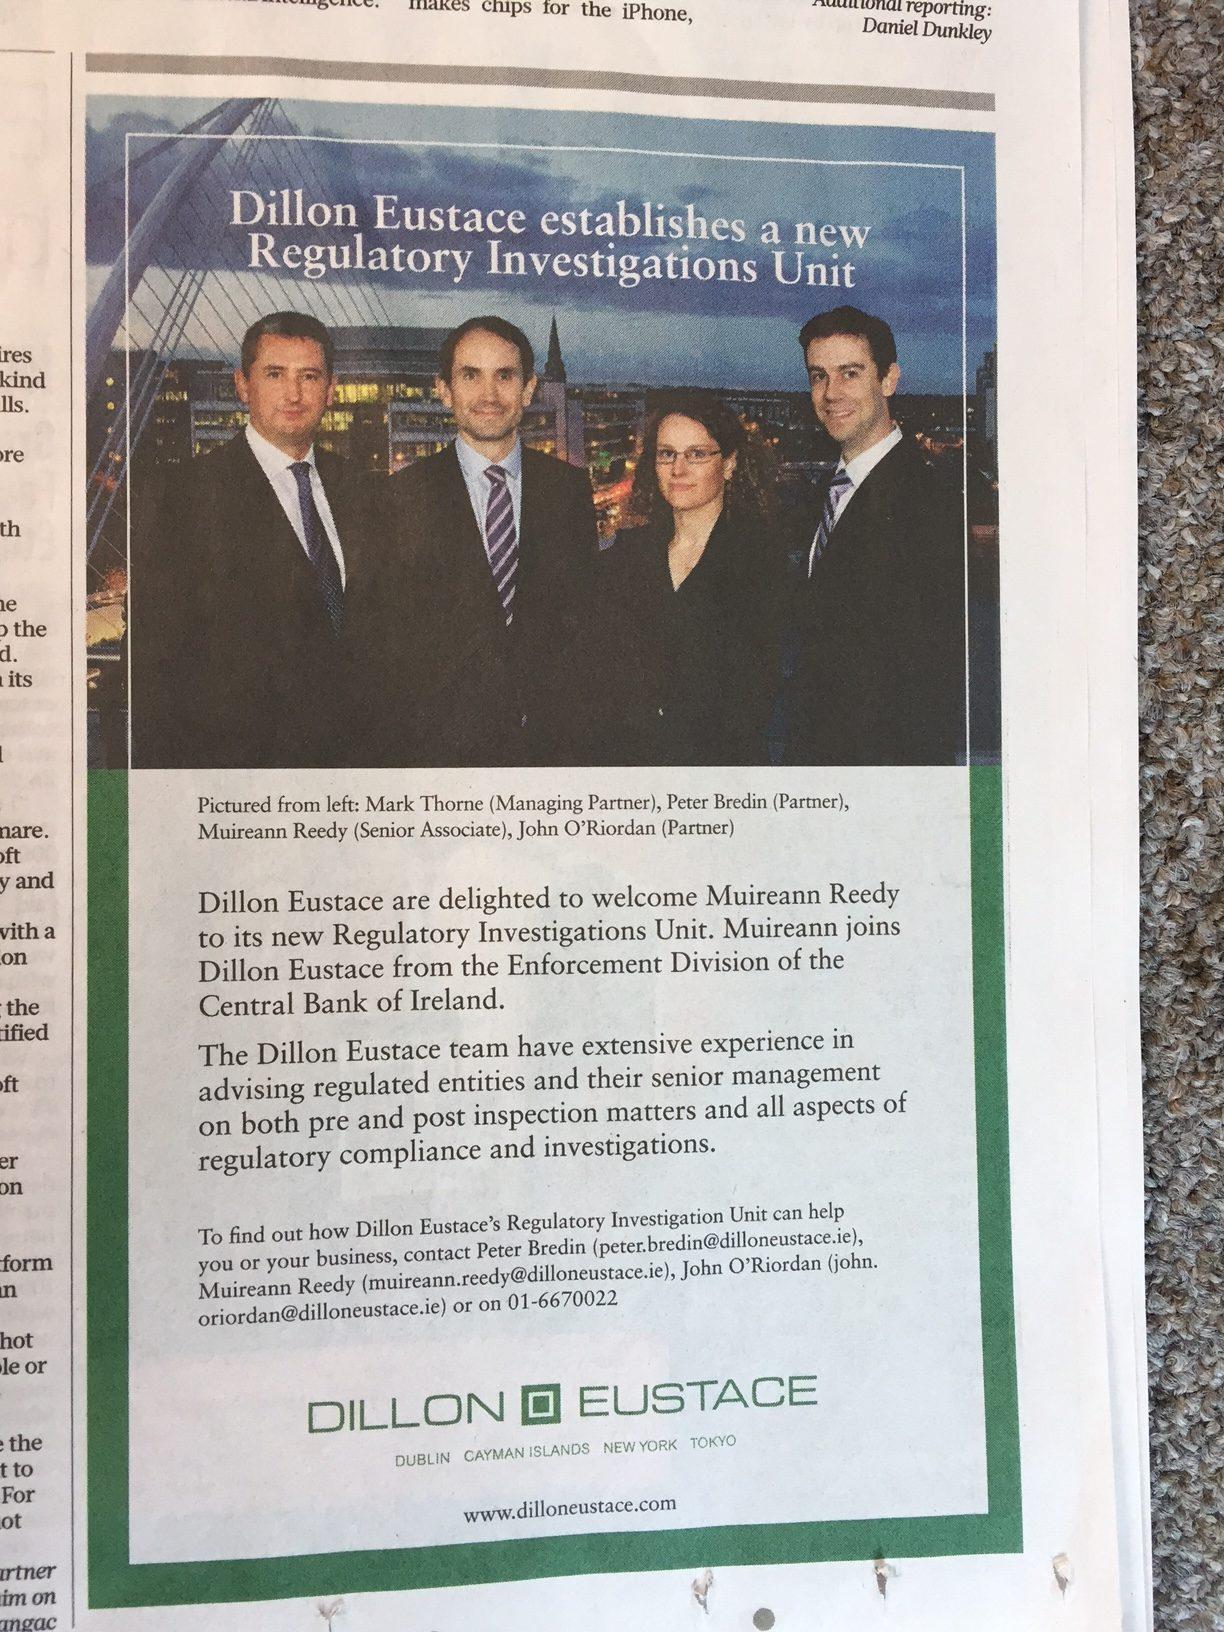 Dillon Eustace establishes a new Regulatory Investigations Unit